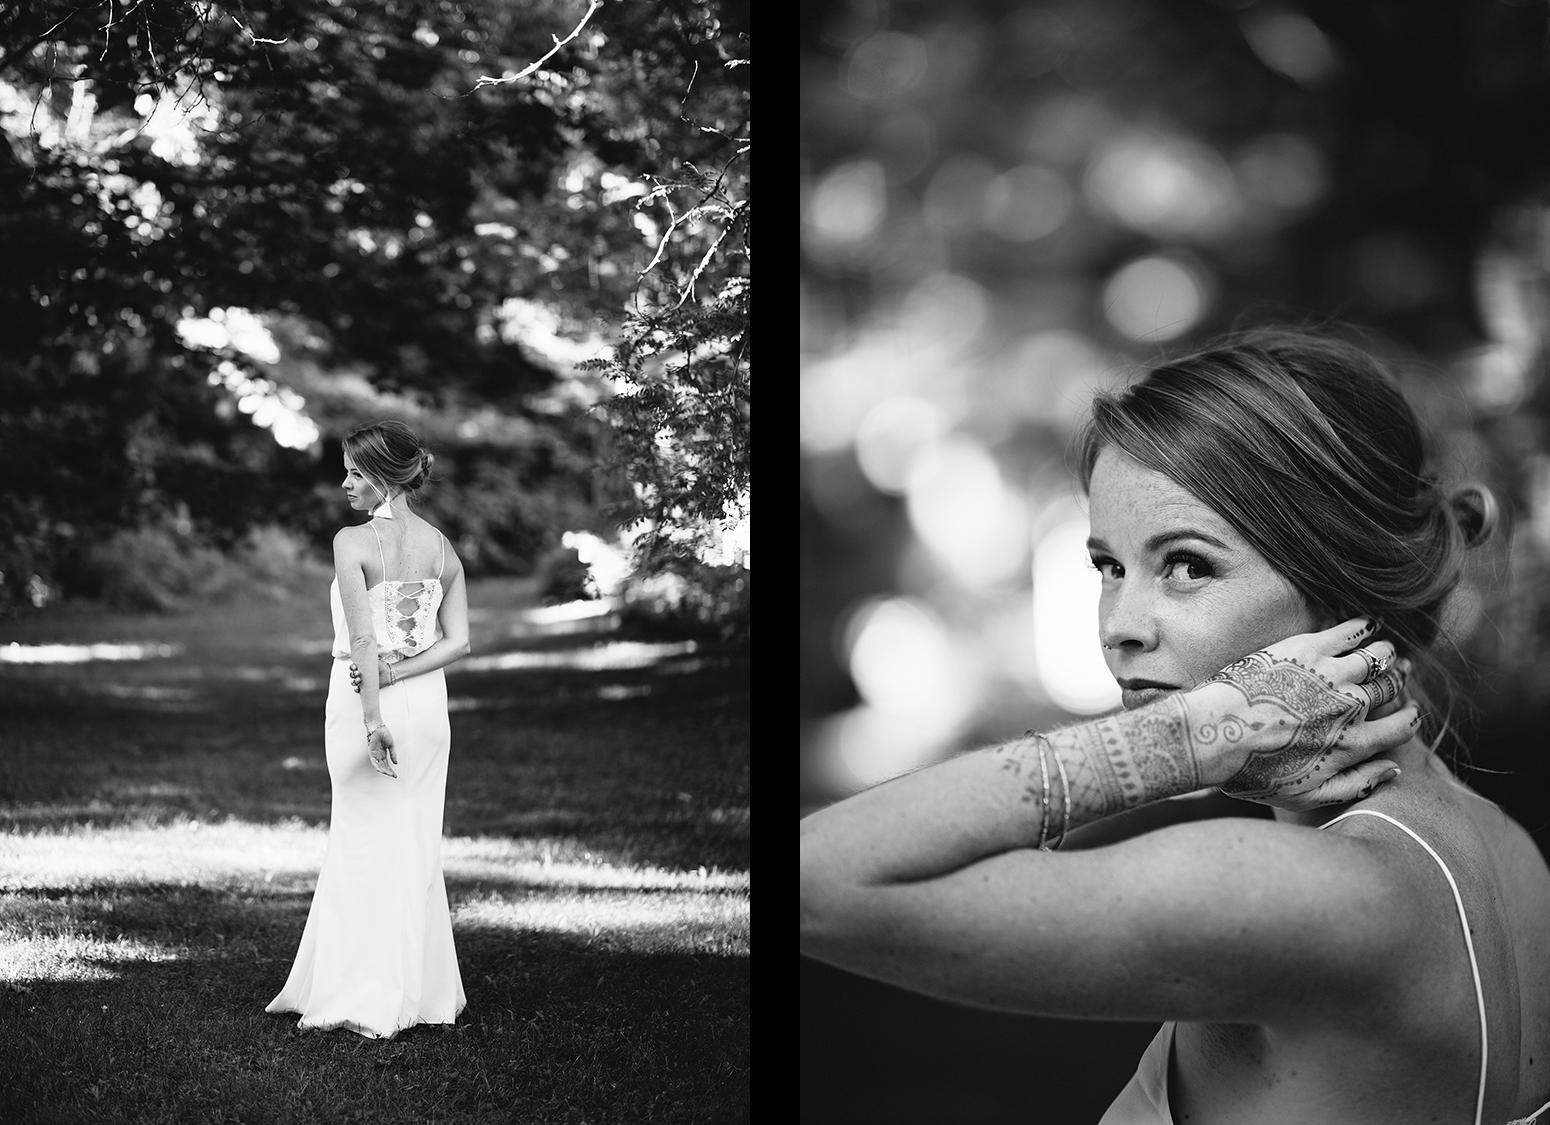 spread15-Wedding-Photographers-Toronto-Kodak-Trix-35mm-Photography-Ontario-Canada-wedding-couple-candid-portraits-intimate-documentary-fine-art-aesthetic-lifestyle-bridal-portrait-fashion-editorial-portraiture-unique-stunning-blue-eye.jpg